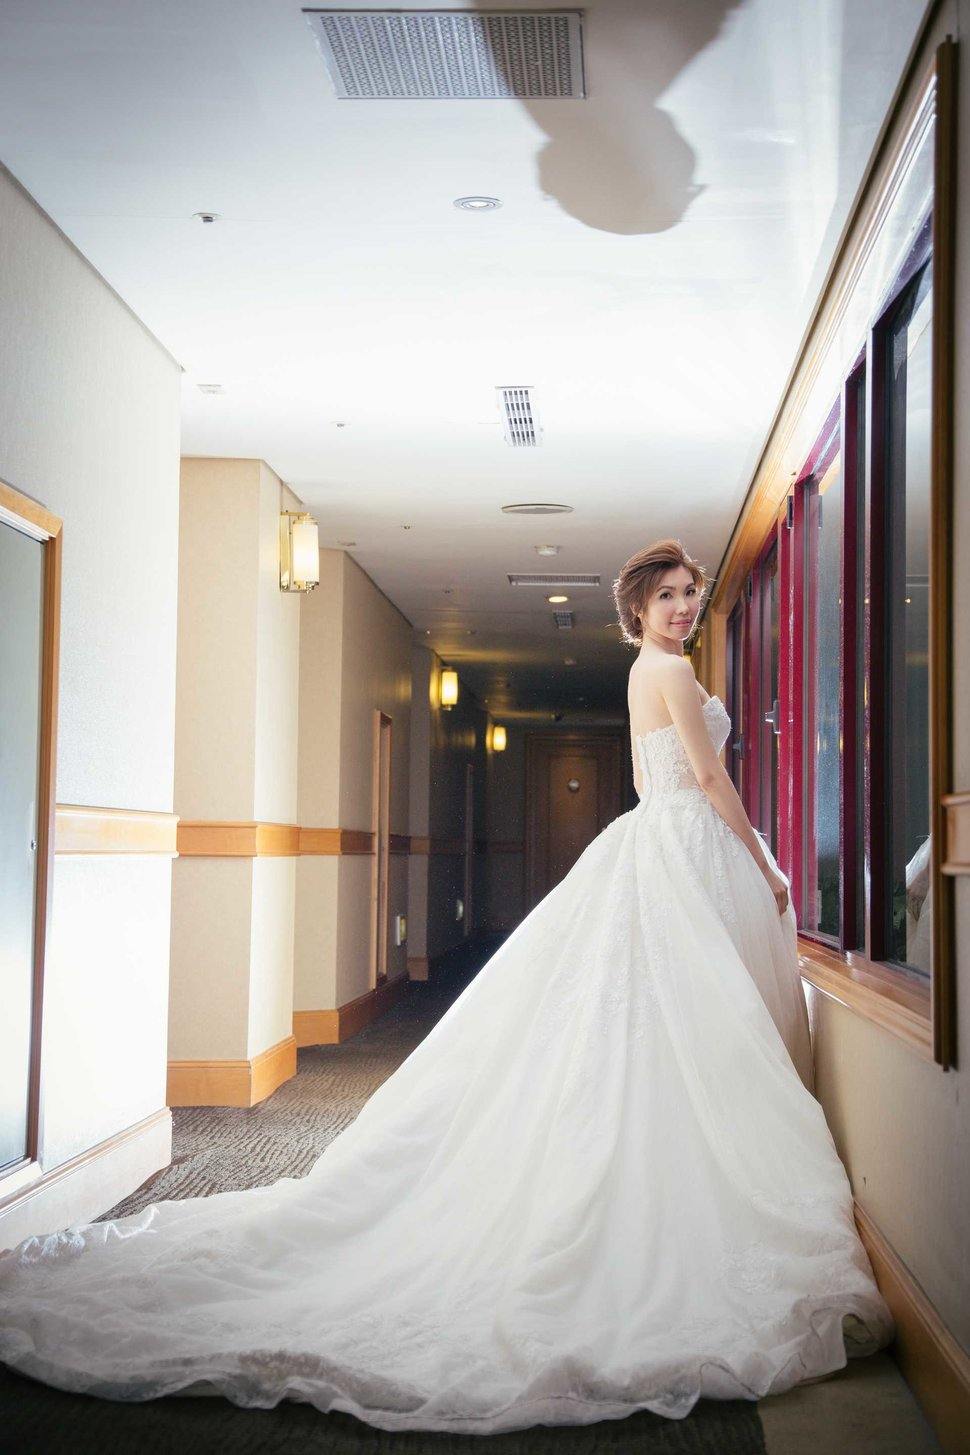 Wedding_Photo_2017_-012 - 高雄婚攝Luke-路克《結婚吧》